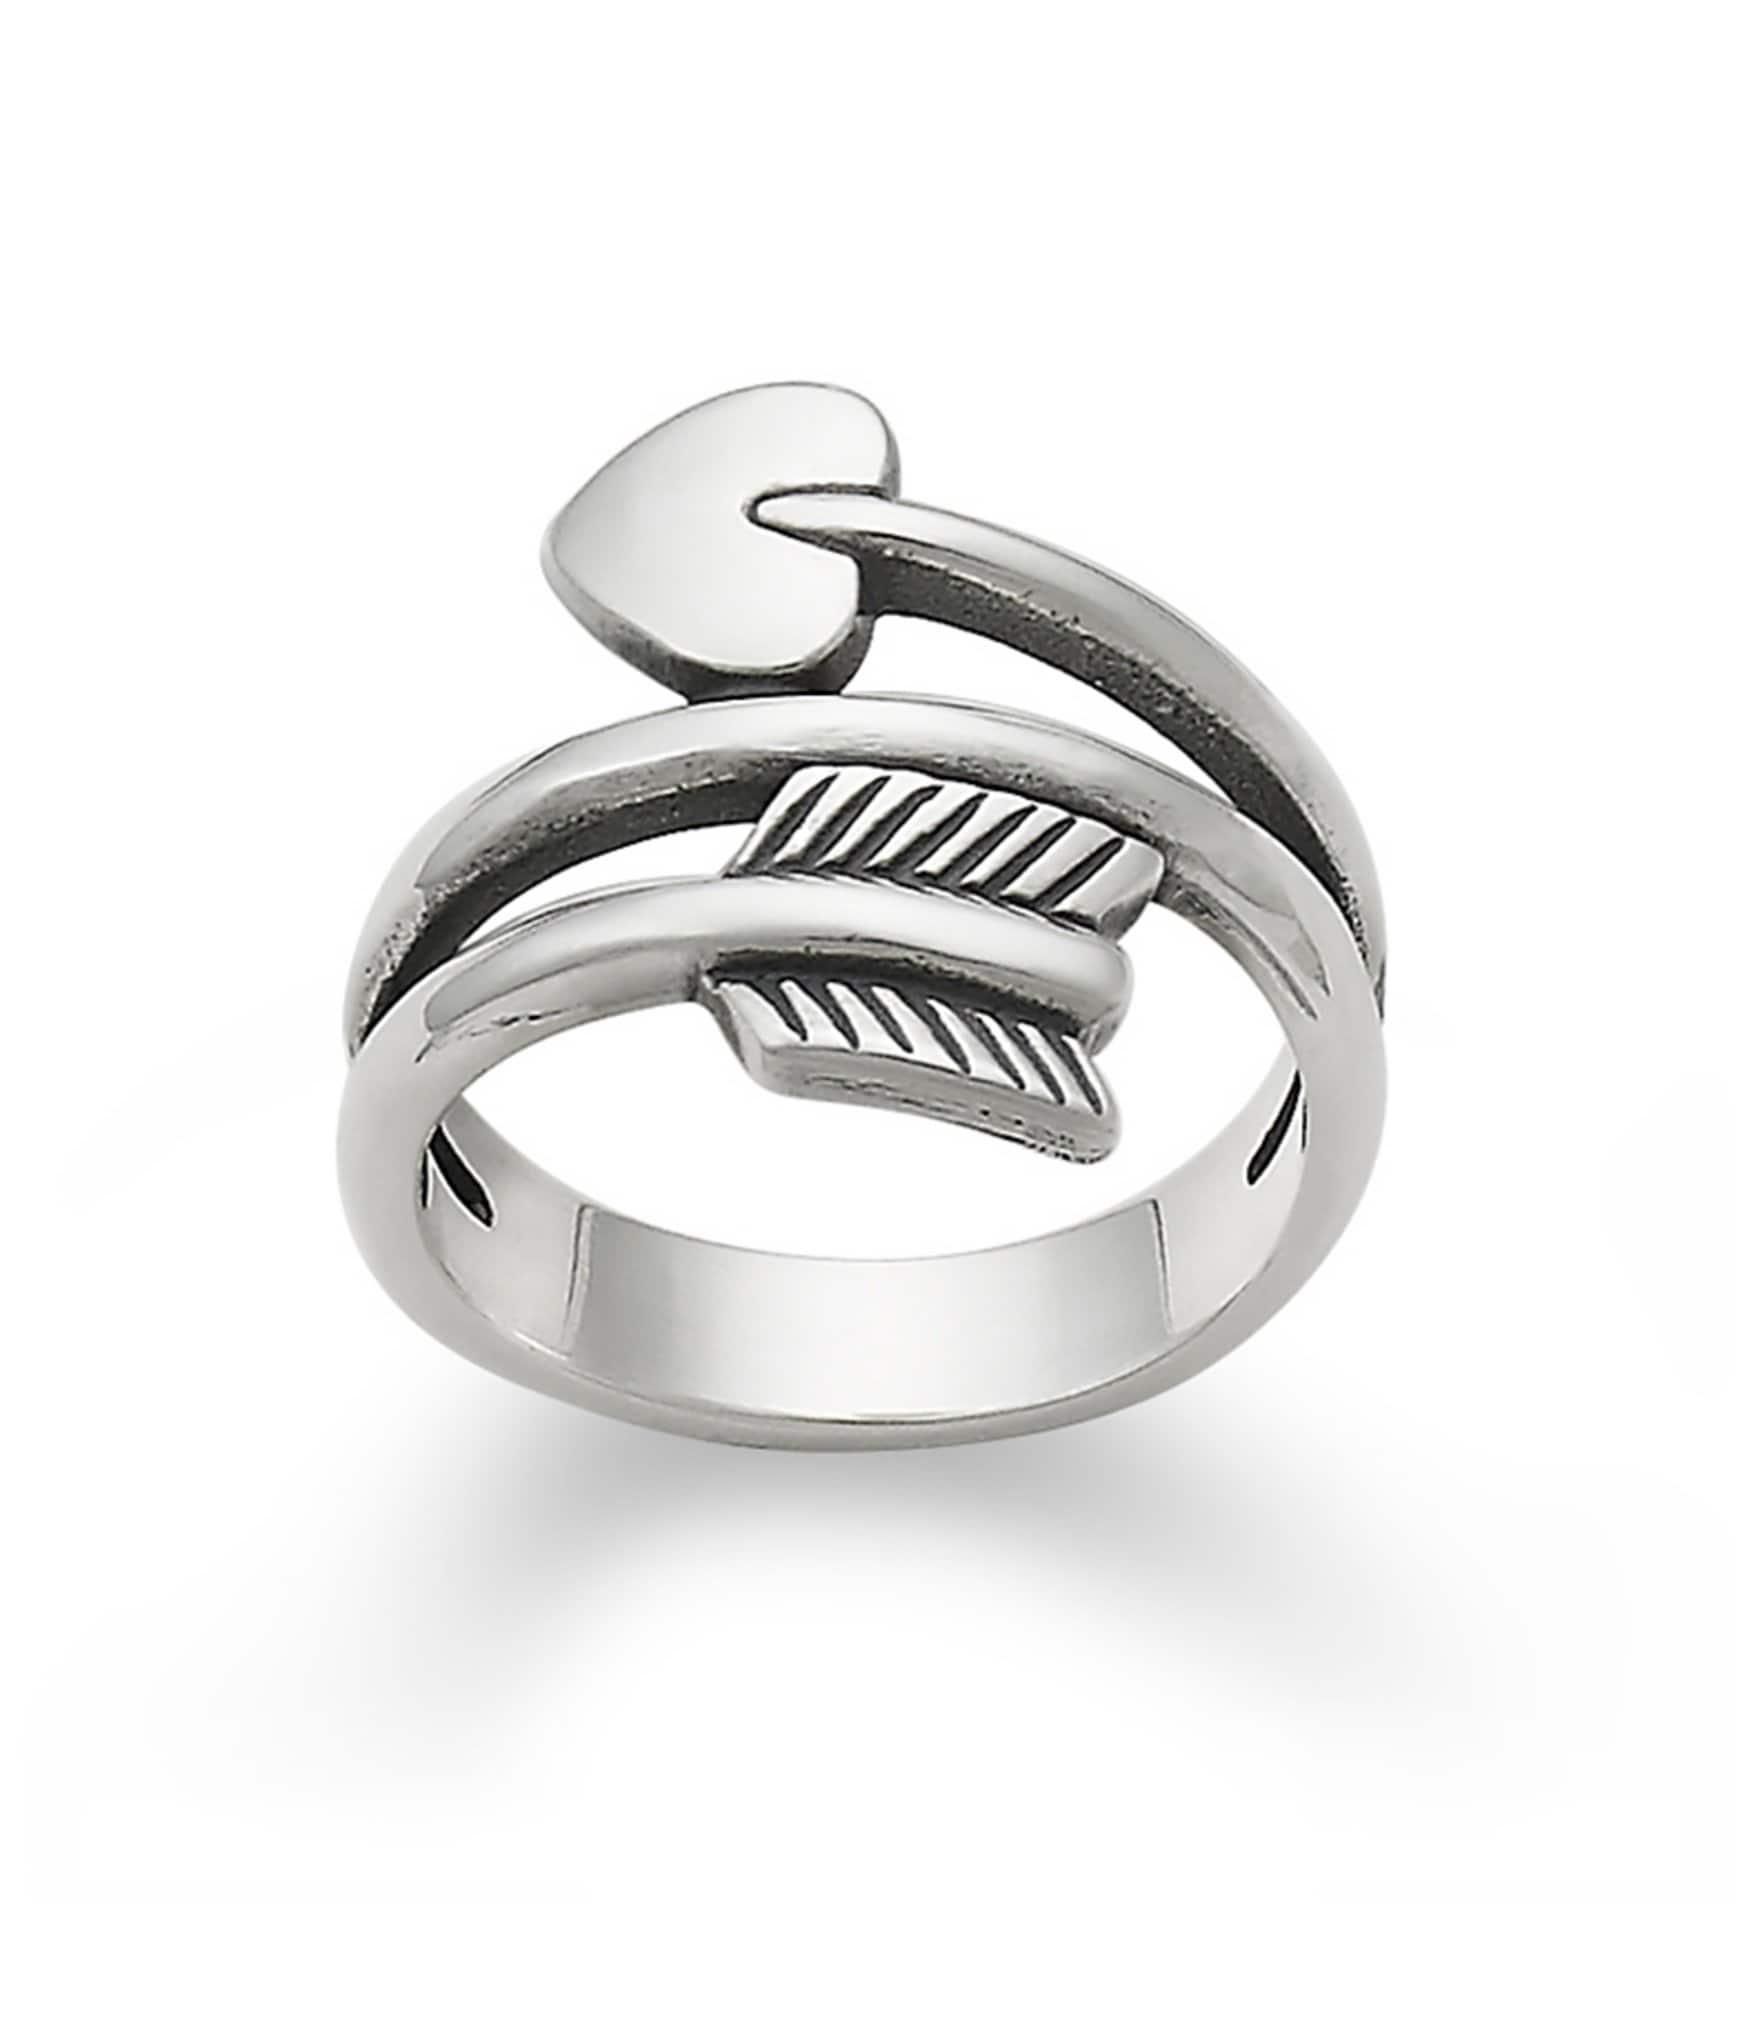 James Avery Jewelry Accessories Jewelry Dillardscom